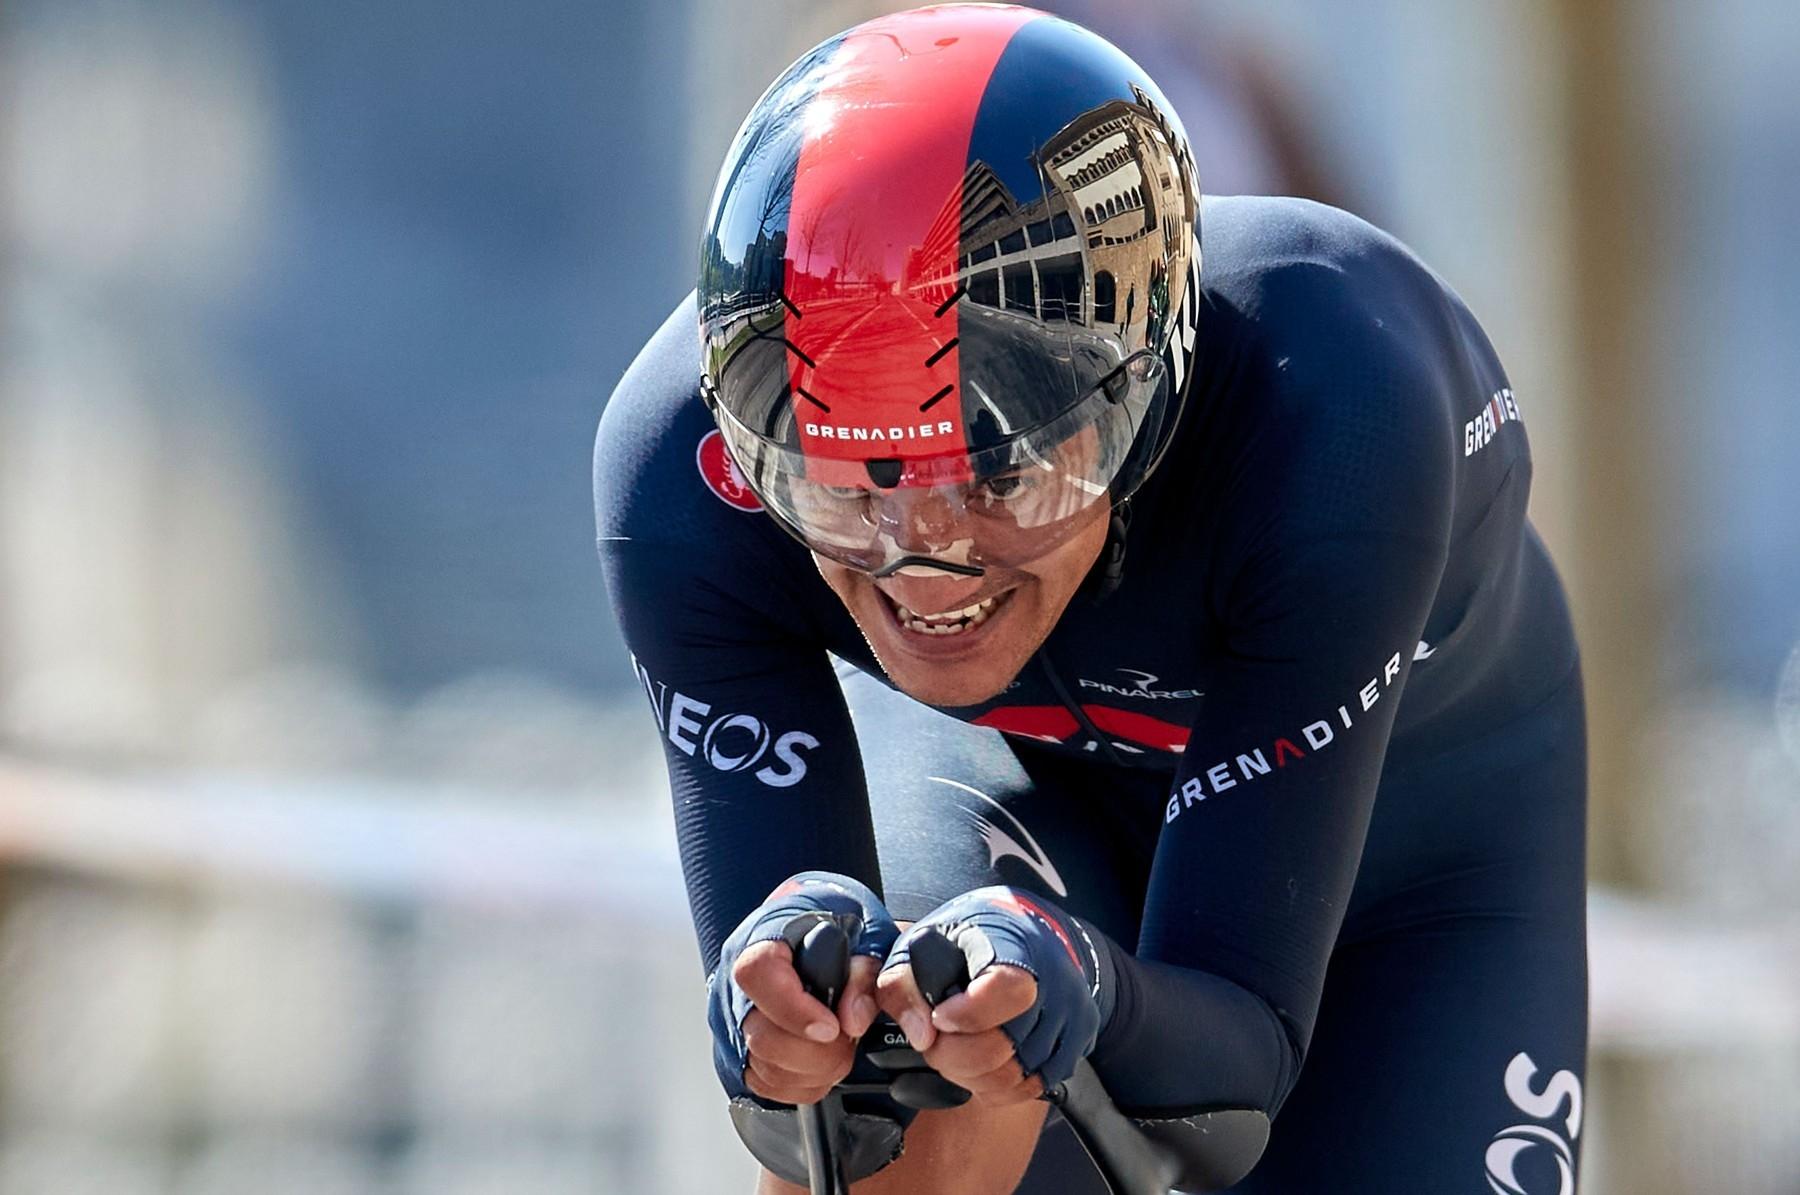 Richard Carapaz potvrdil před Tour de France fantastickou formu. Foto: profimedia